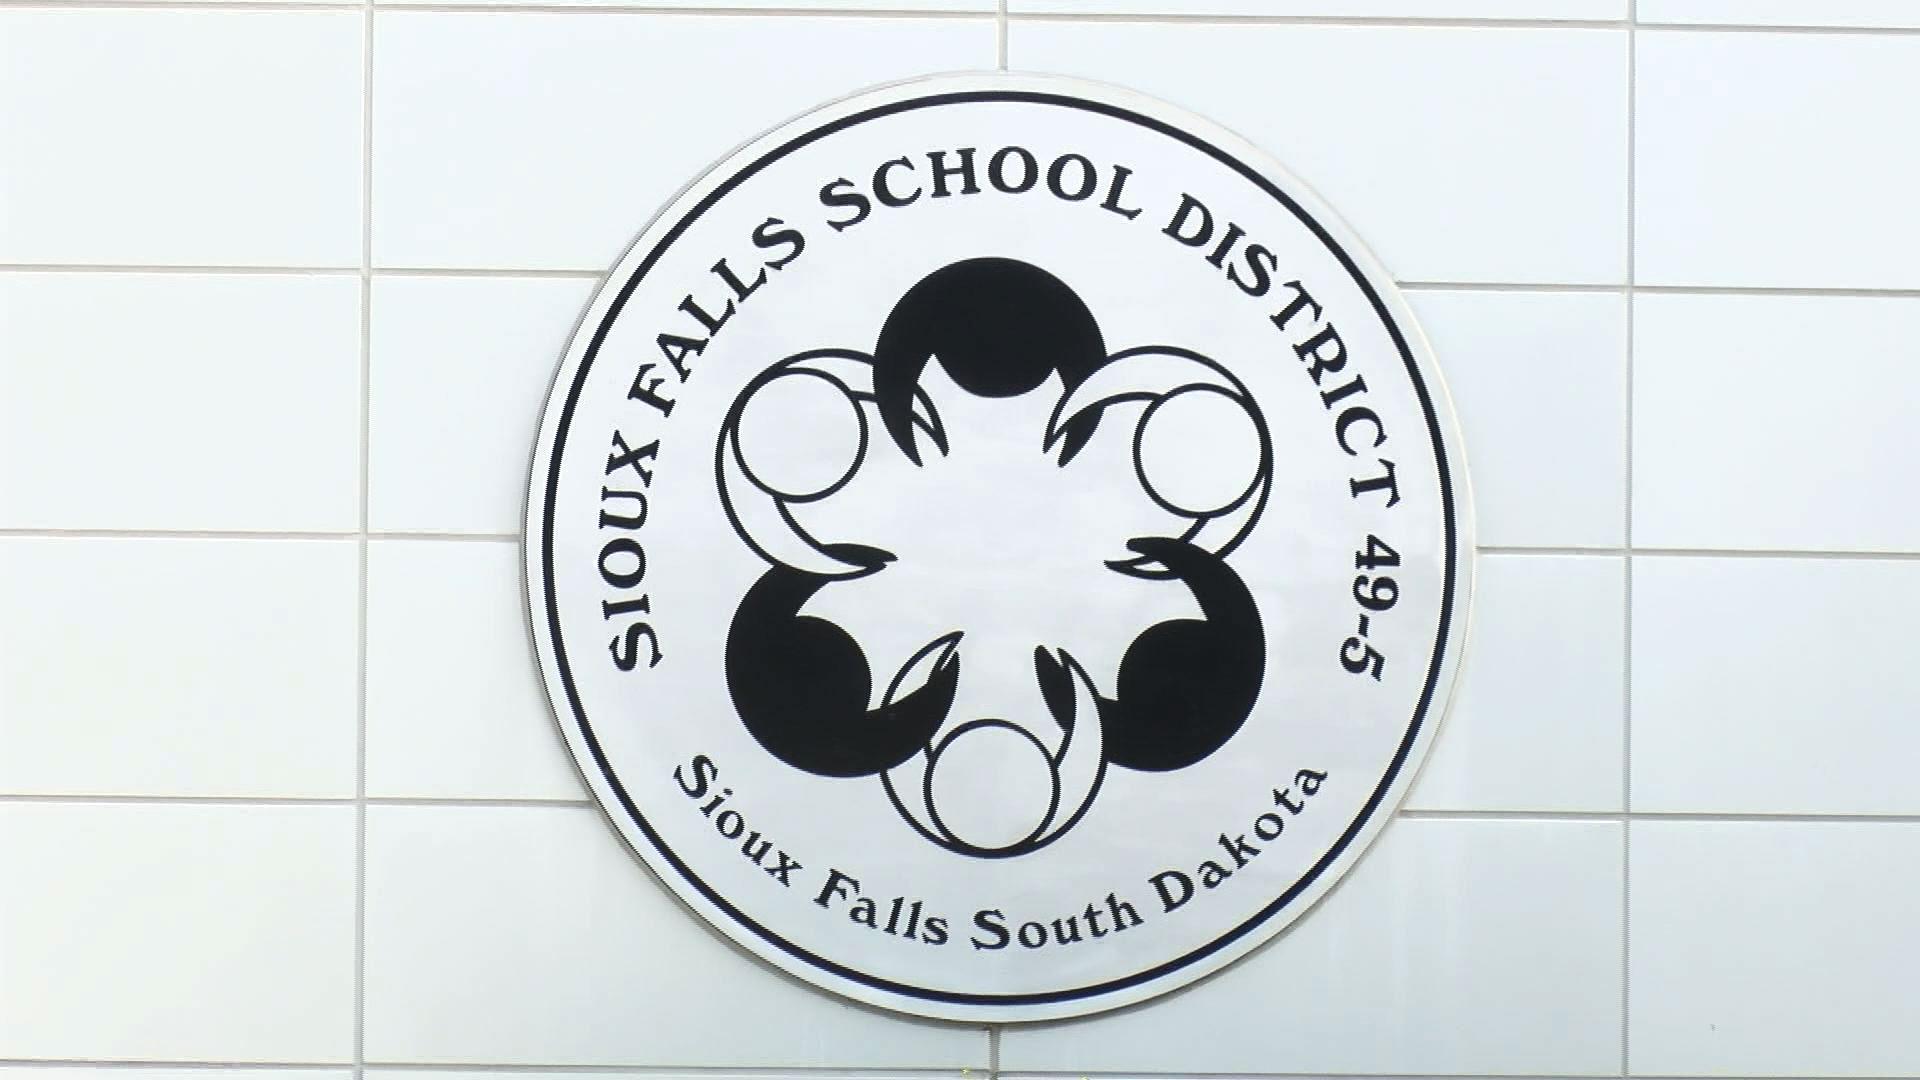 KELO Sioux Falls School District2